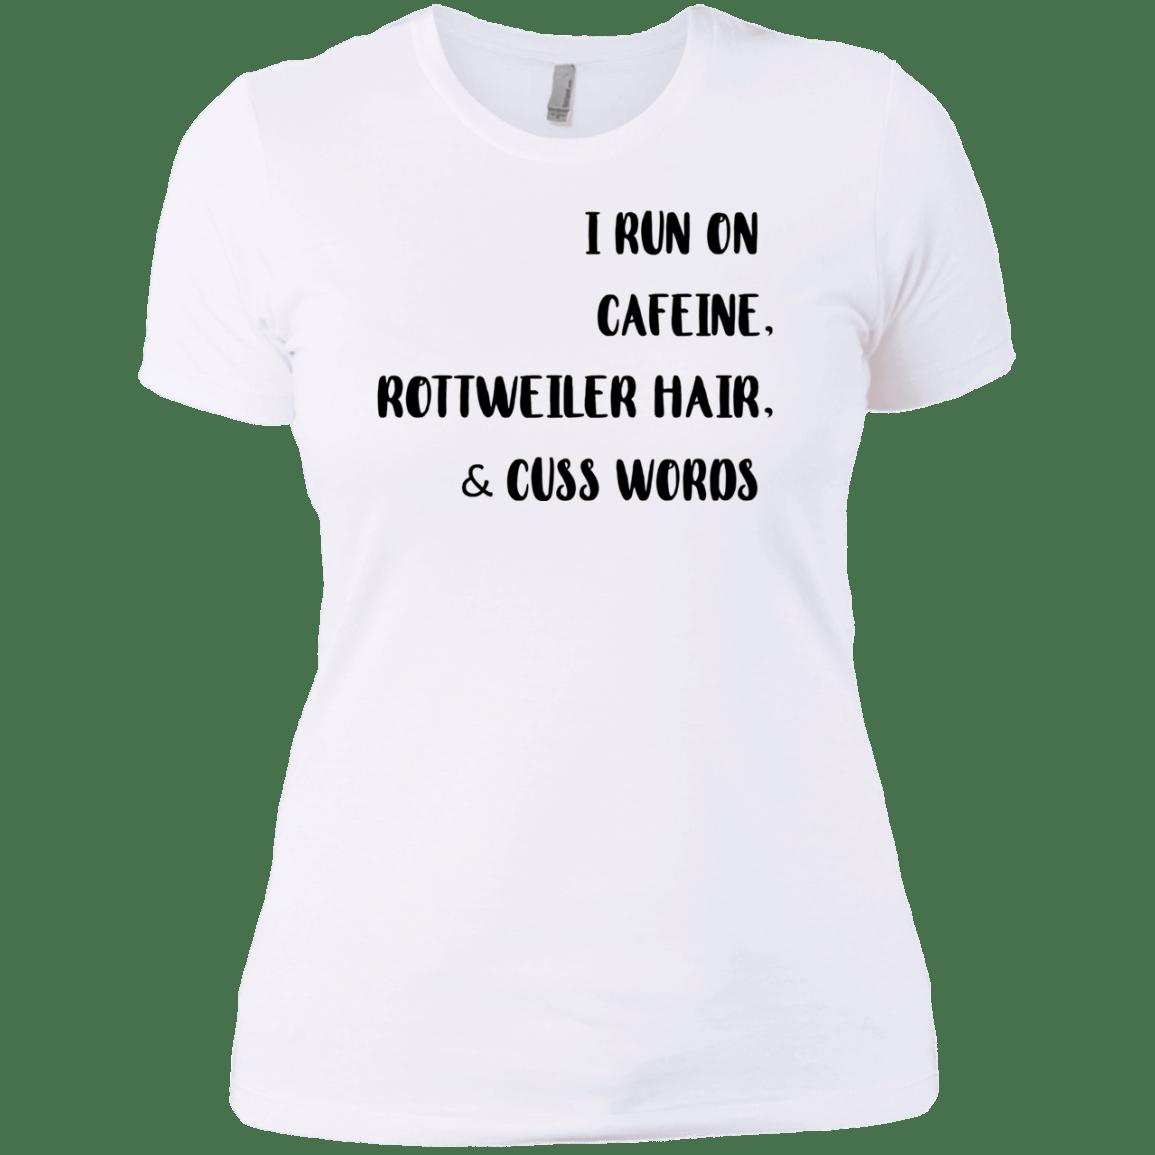 I Run On Cafeine Rottweiler Hair And Cuss Words Shirt Hoodie